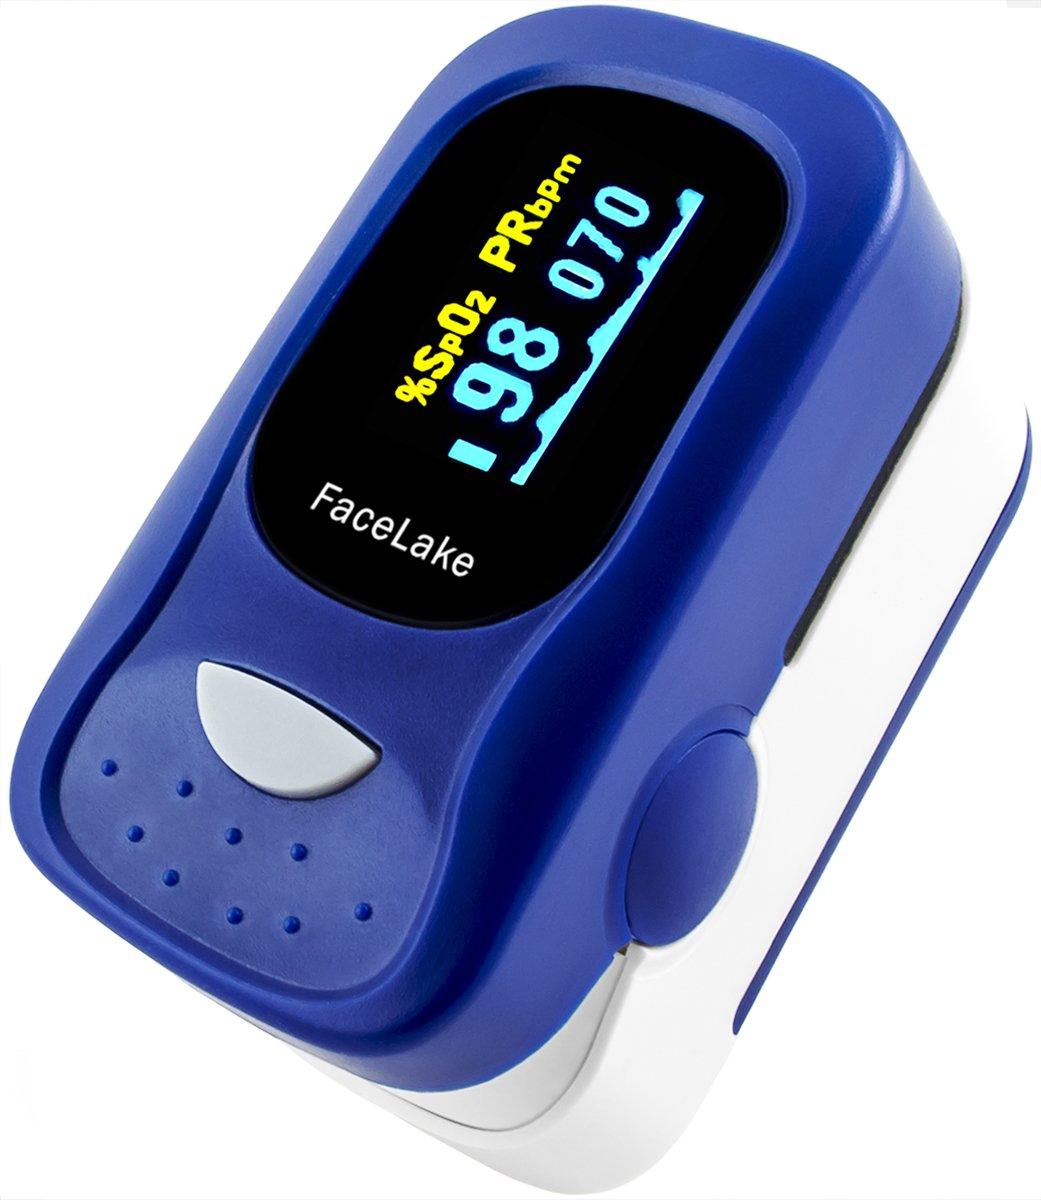 Amazon.com: Pulse Oximeter, Blood Oxygen Monitor: Industrial & Scientific